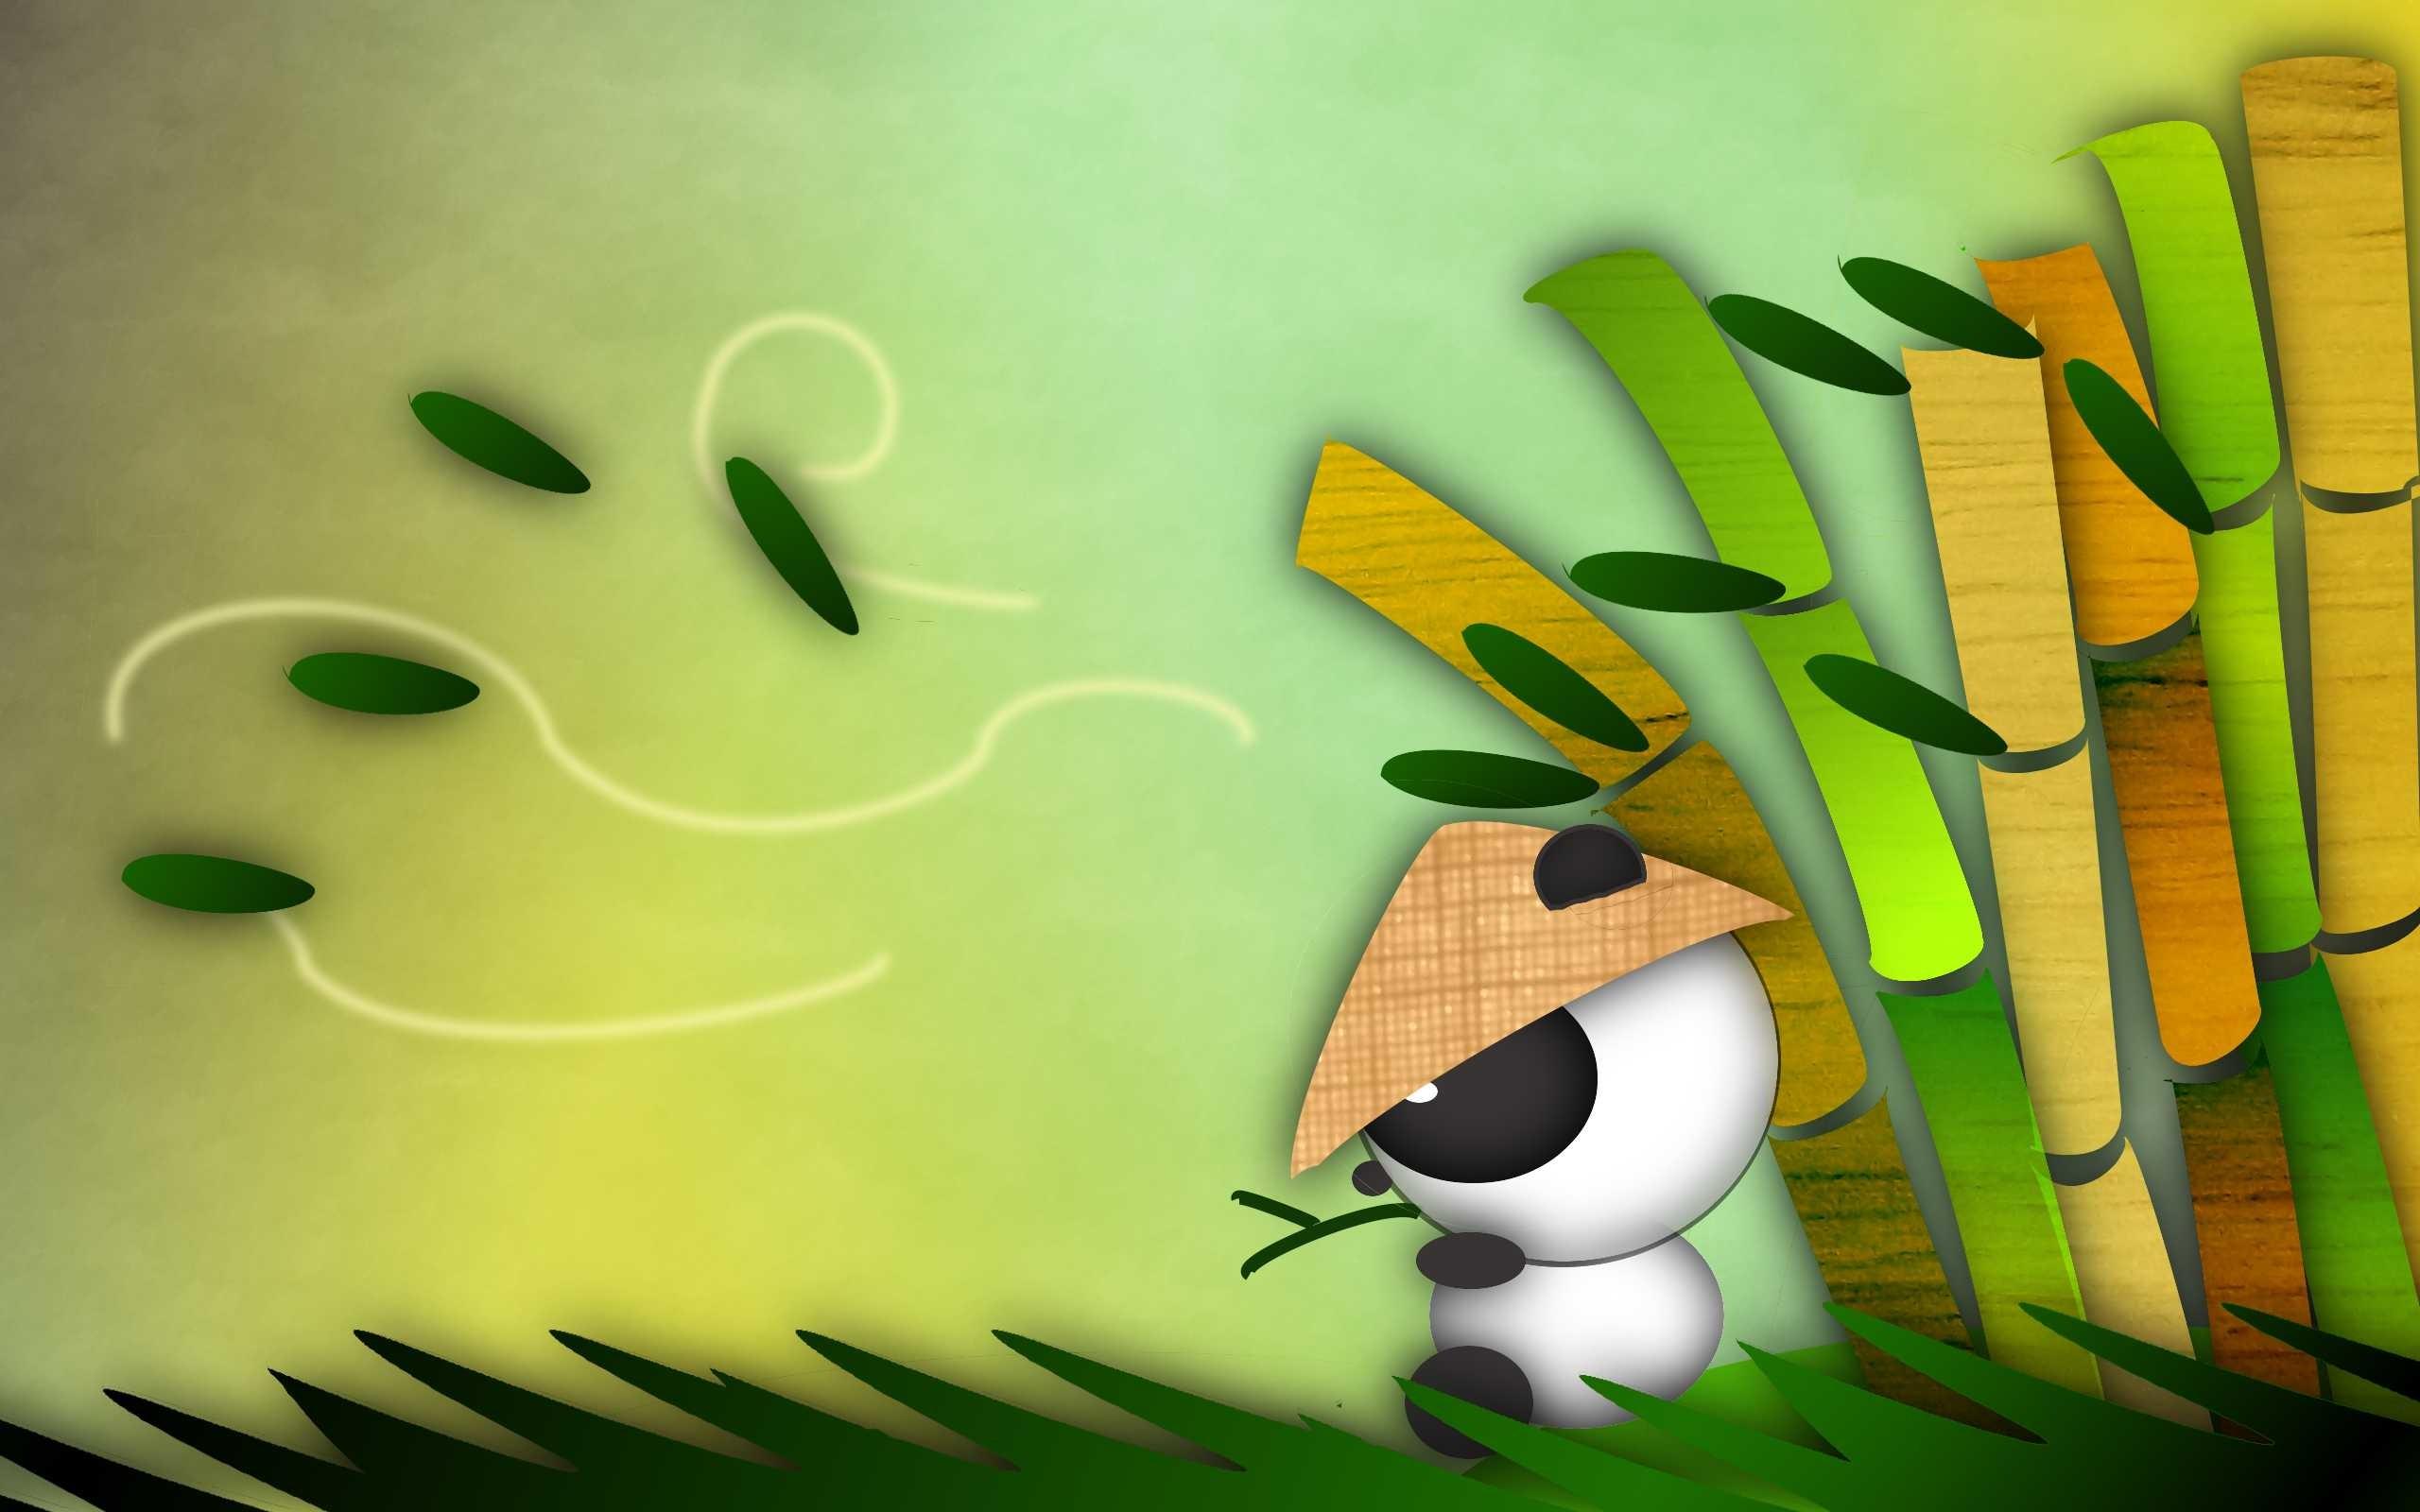 Cute Wallpapers Free Download Funny Cute Cartoon Pics